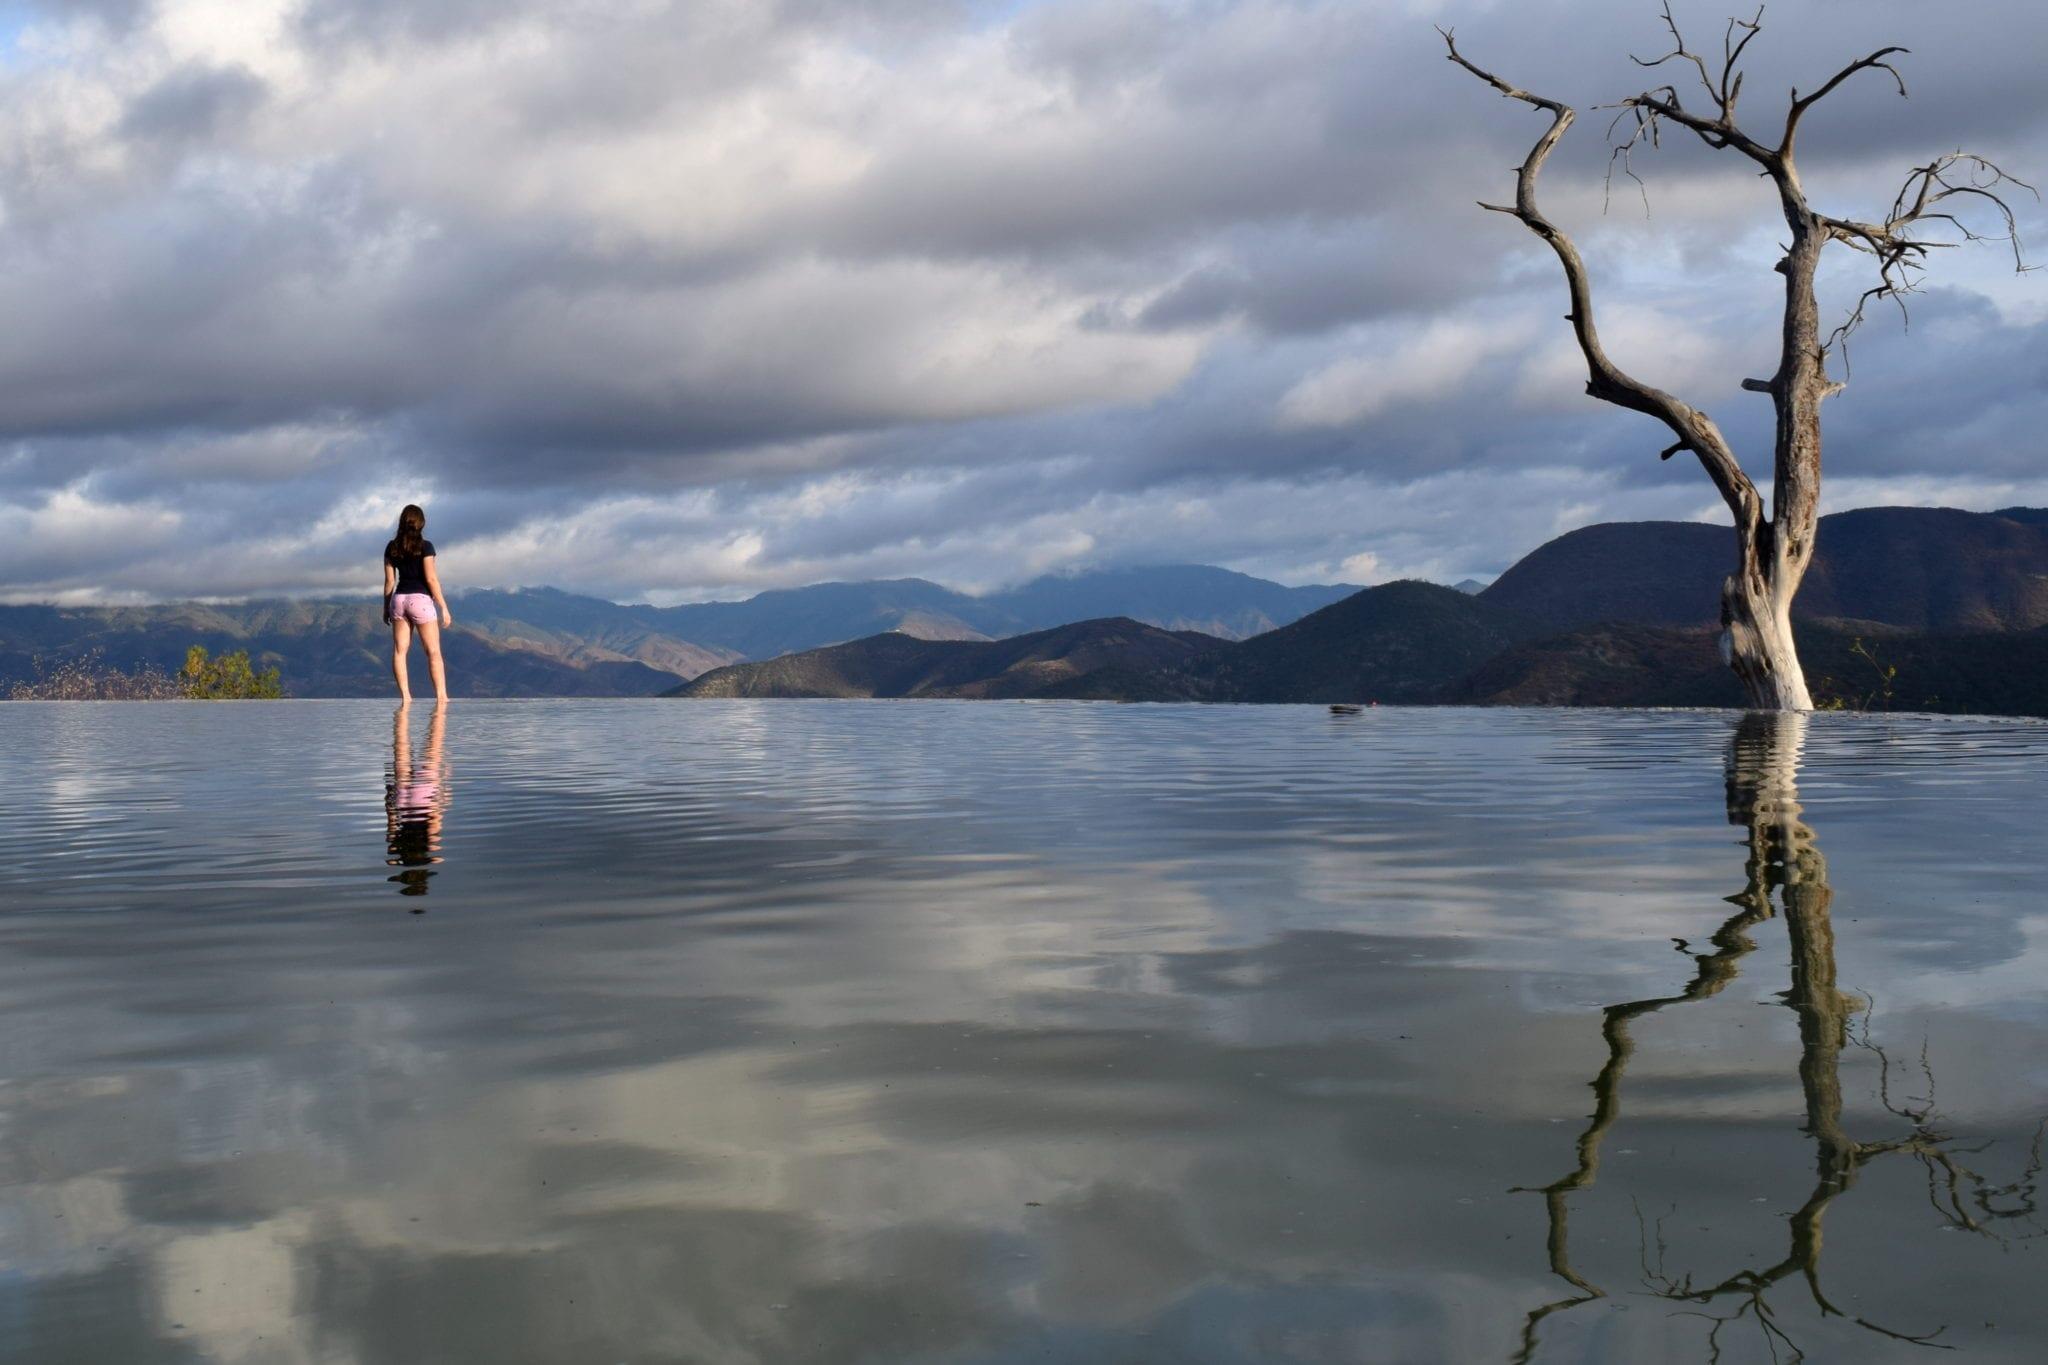 Things to Do in Oaxaca: Hierve el Agua